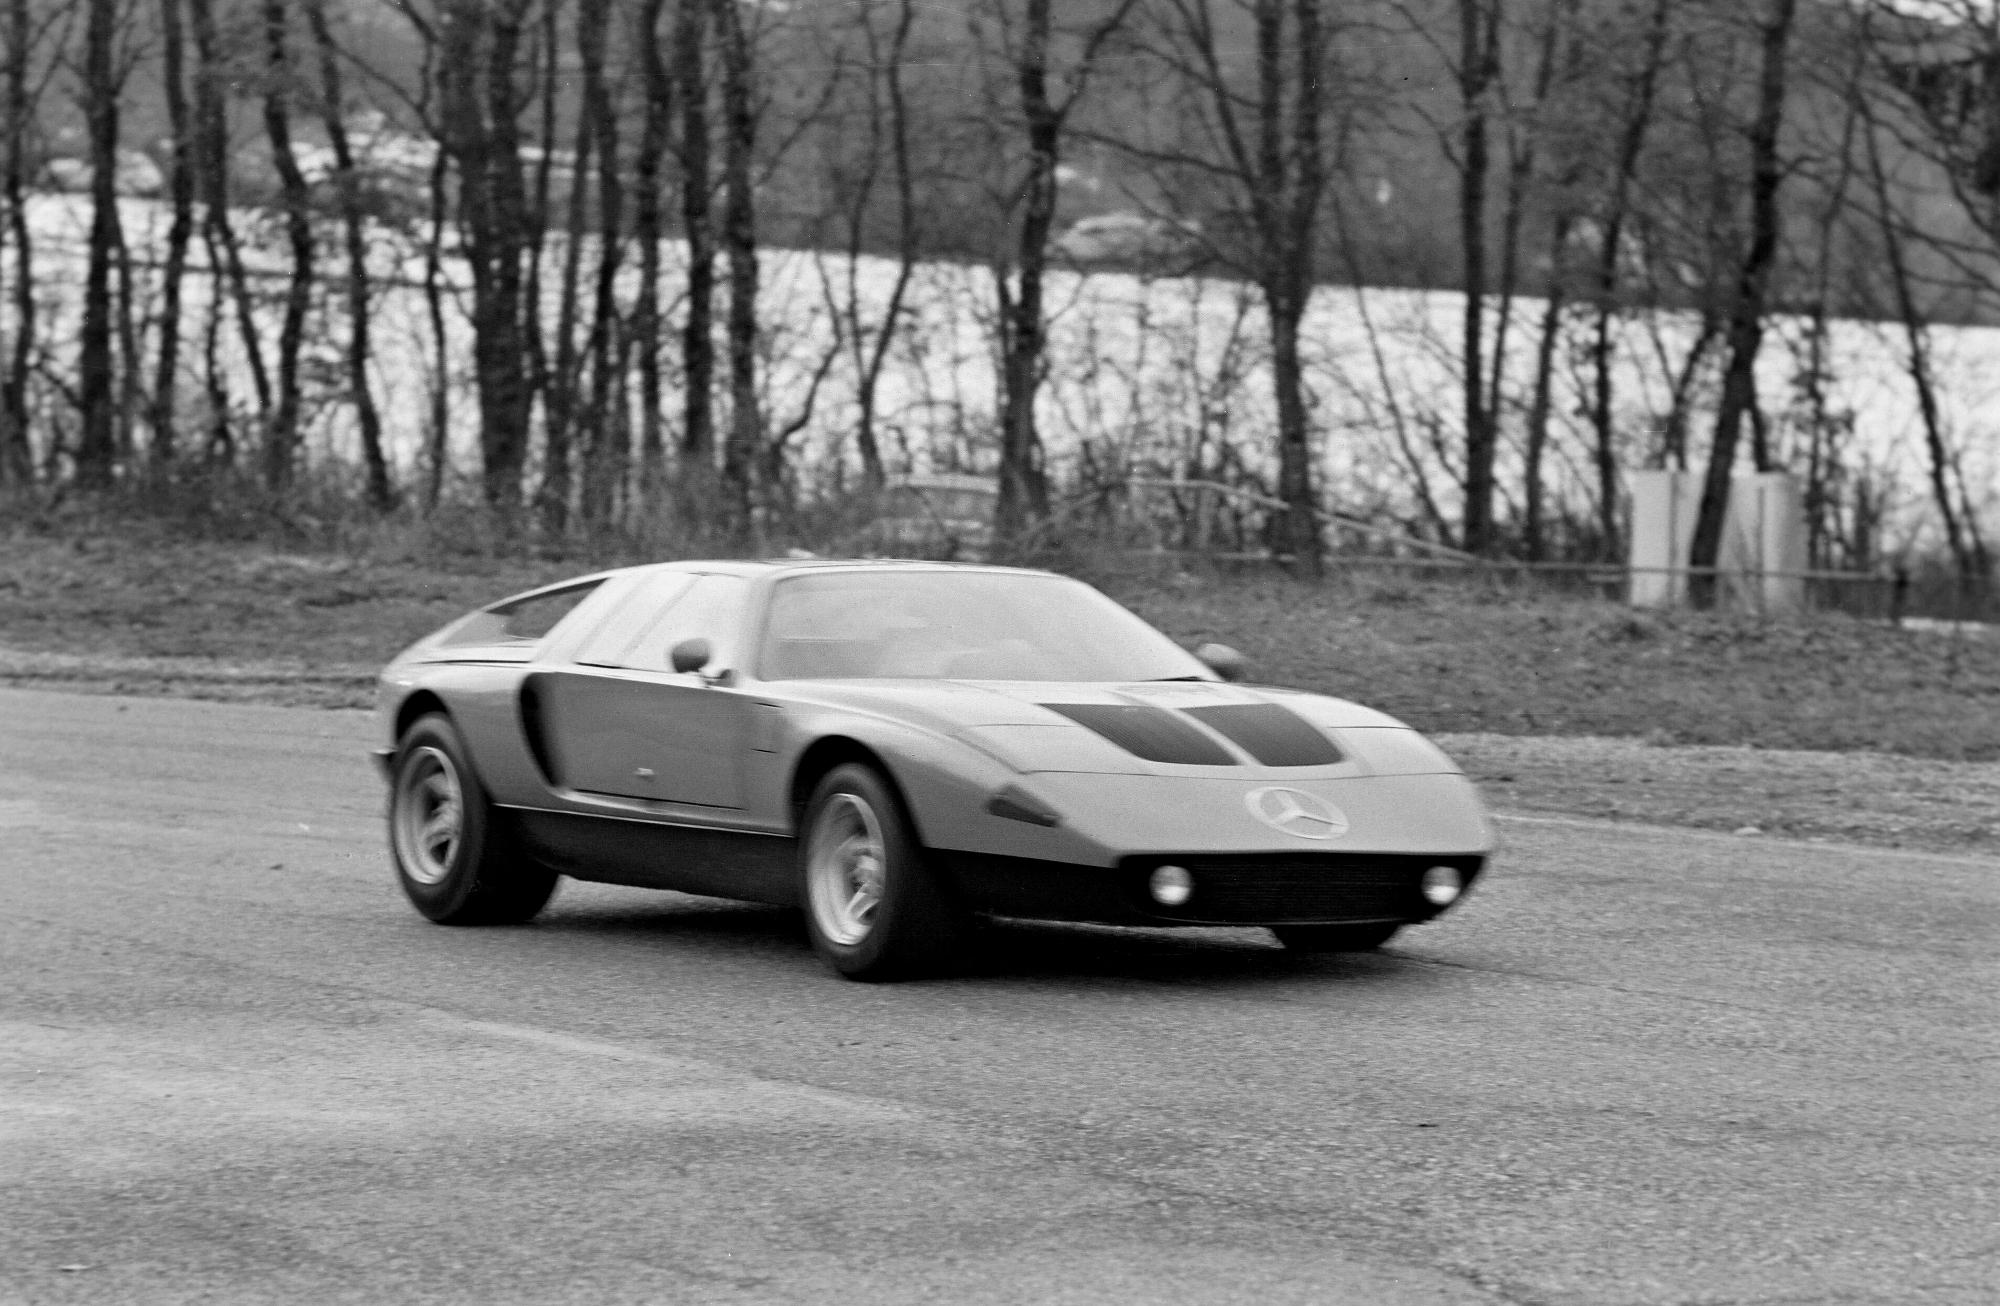 Mercedes C 111-II: premiéra pred 50 rokmi na ženevskom autosalóne 1970 Gnc4TDFbM4 mercedes-c111-ii-3